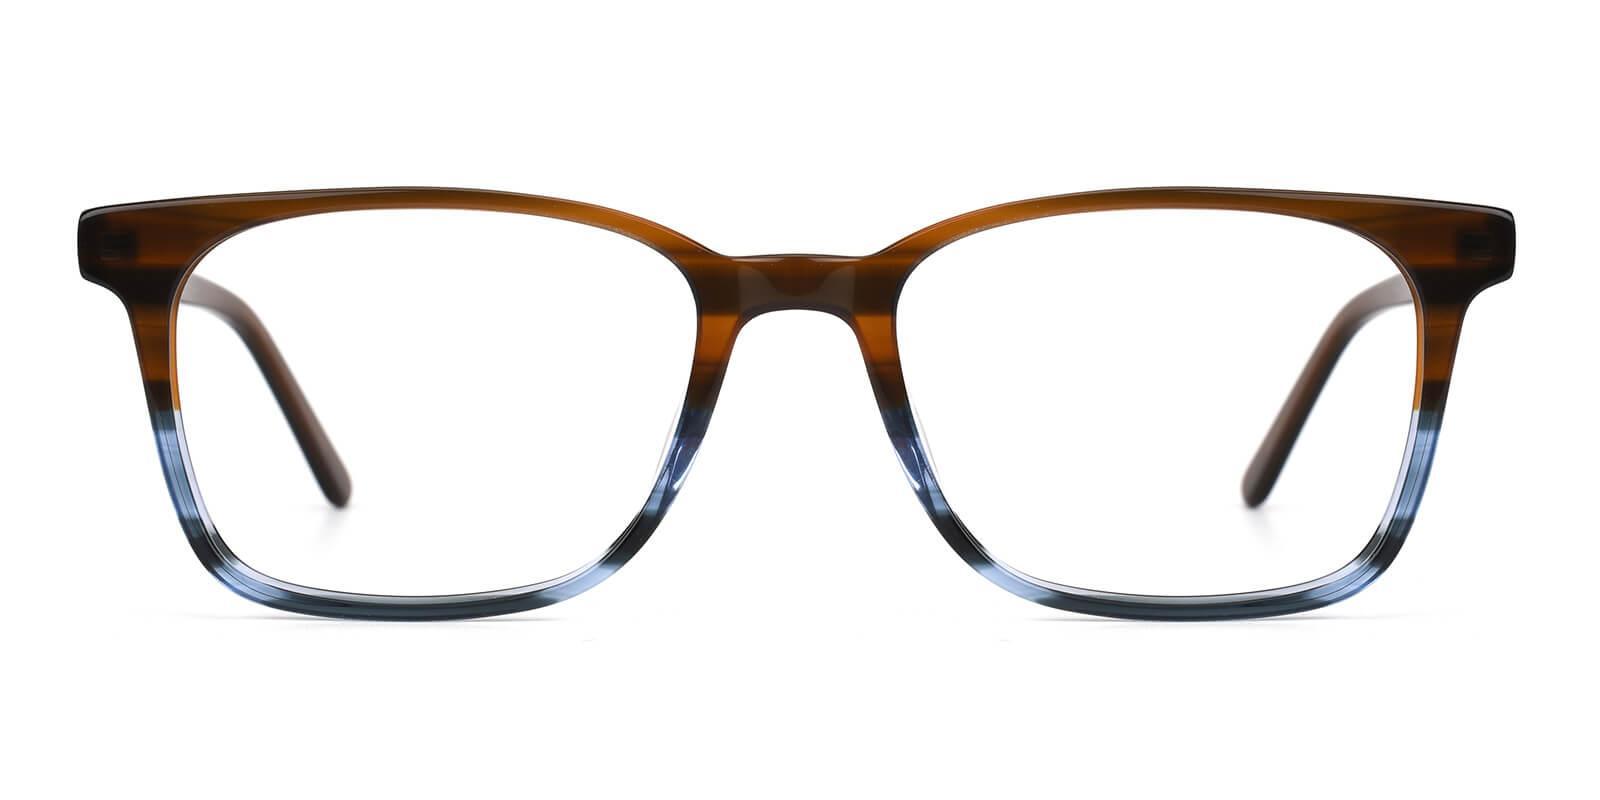 Kattan-Brown-Square-Acetate-Eyeglasses-detail